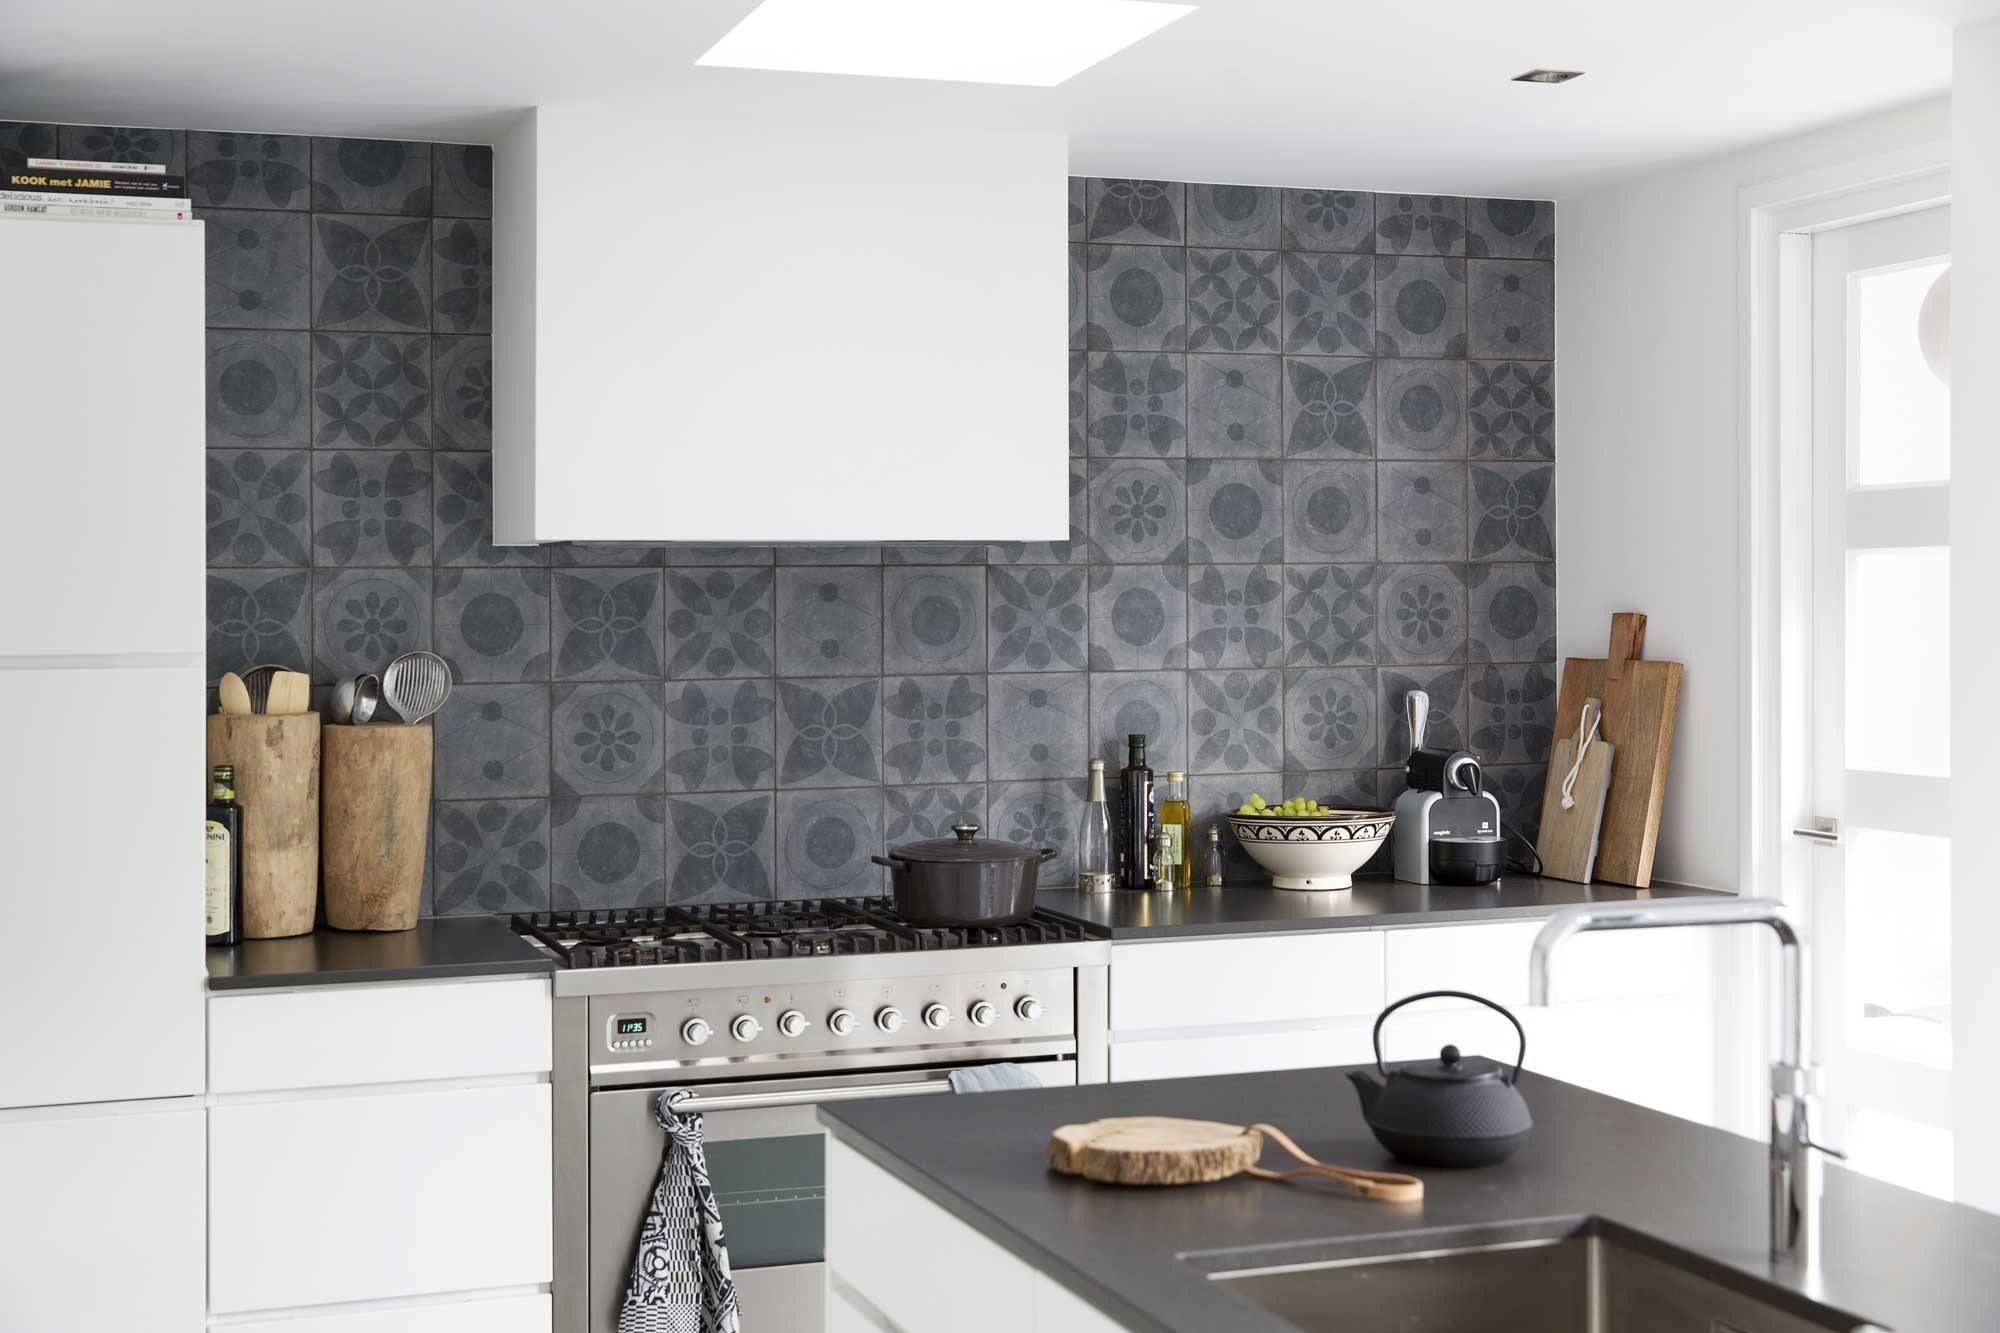 Keuken Achterwand Ideeen : Stoere grijze tegel als achterwand in strakke witte keuken